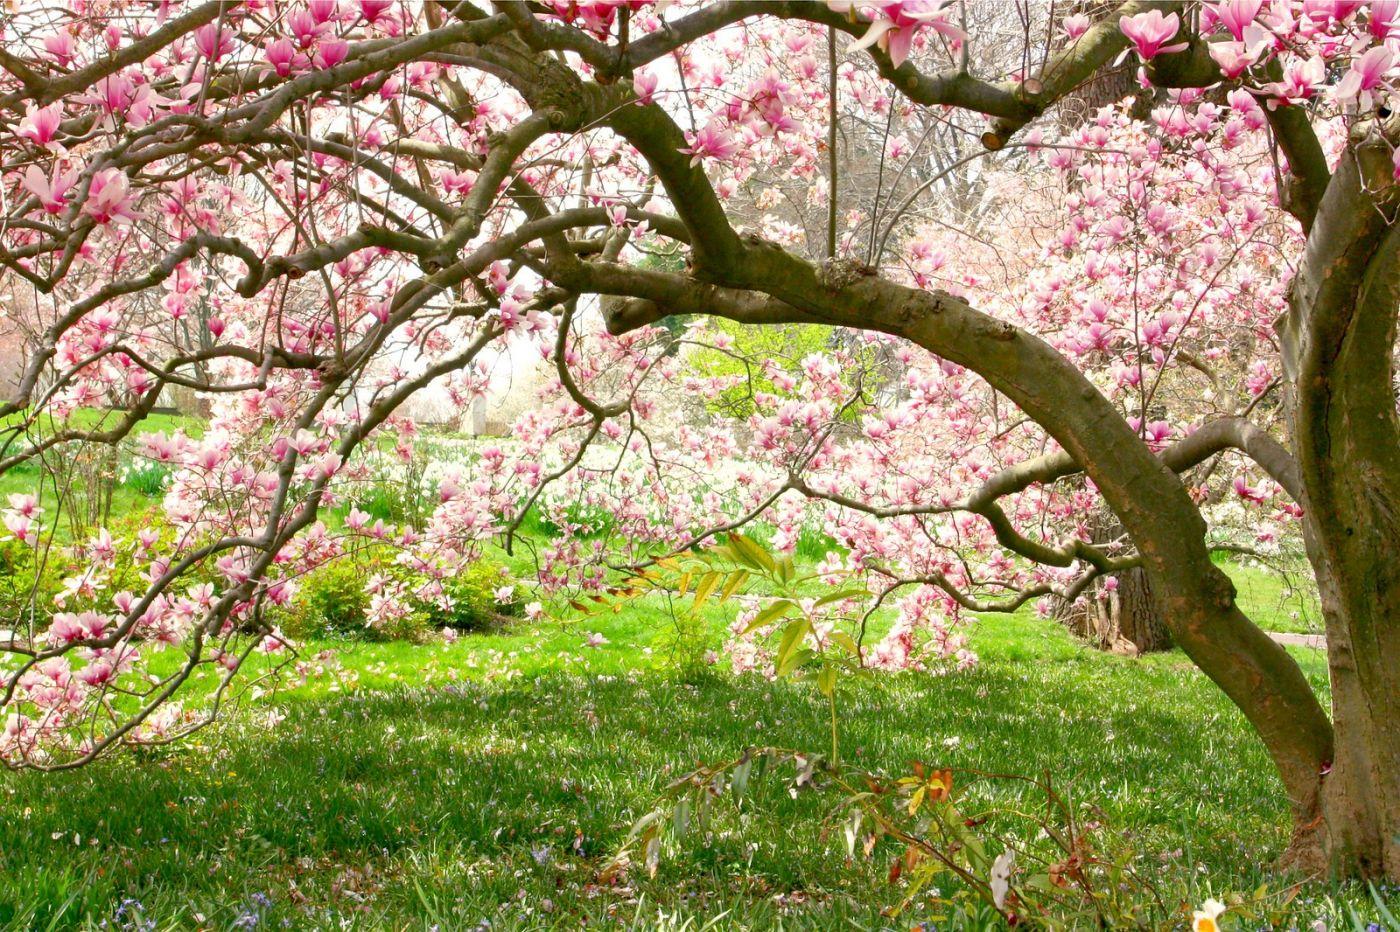 Chanticleer花园,点亮心灵_图1-9